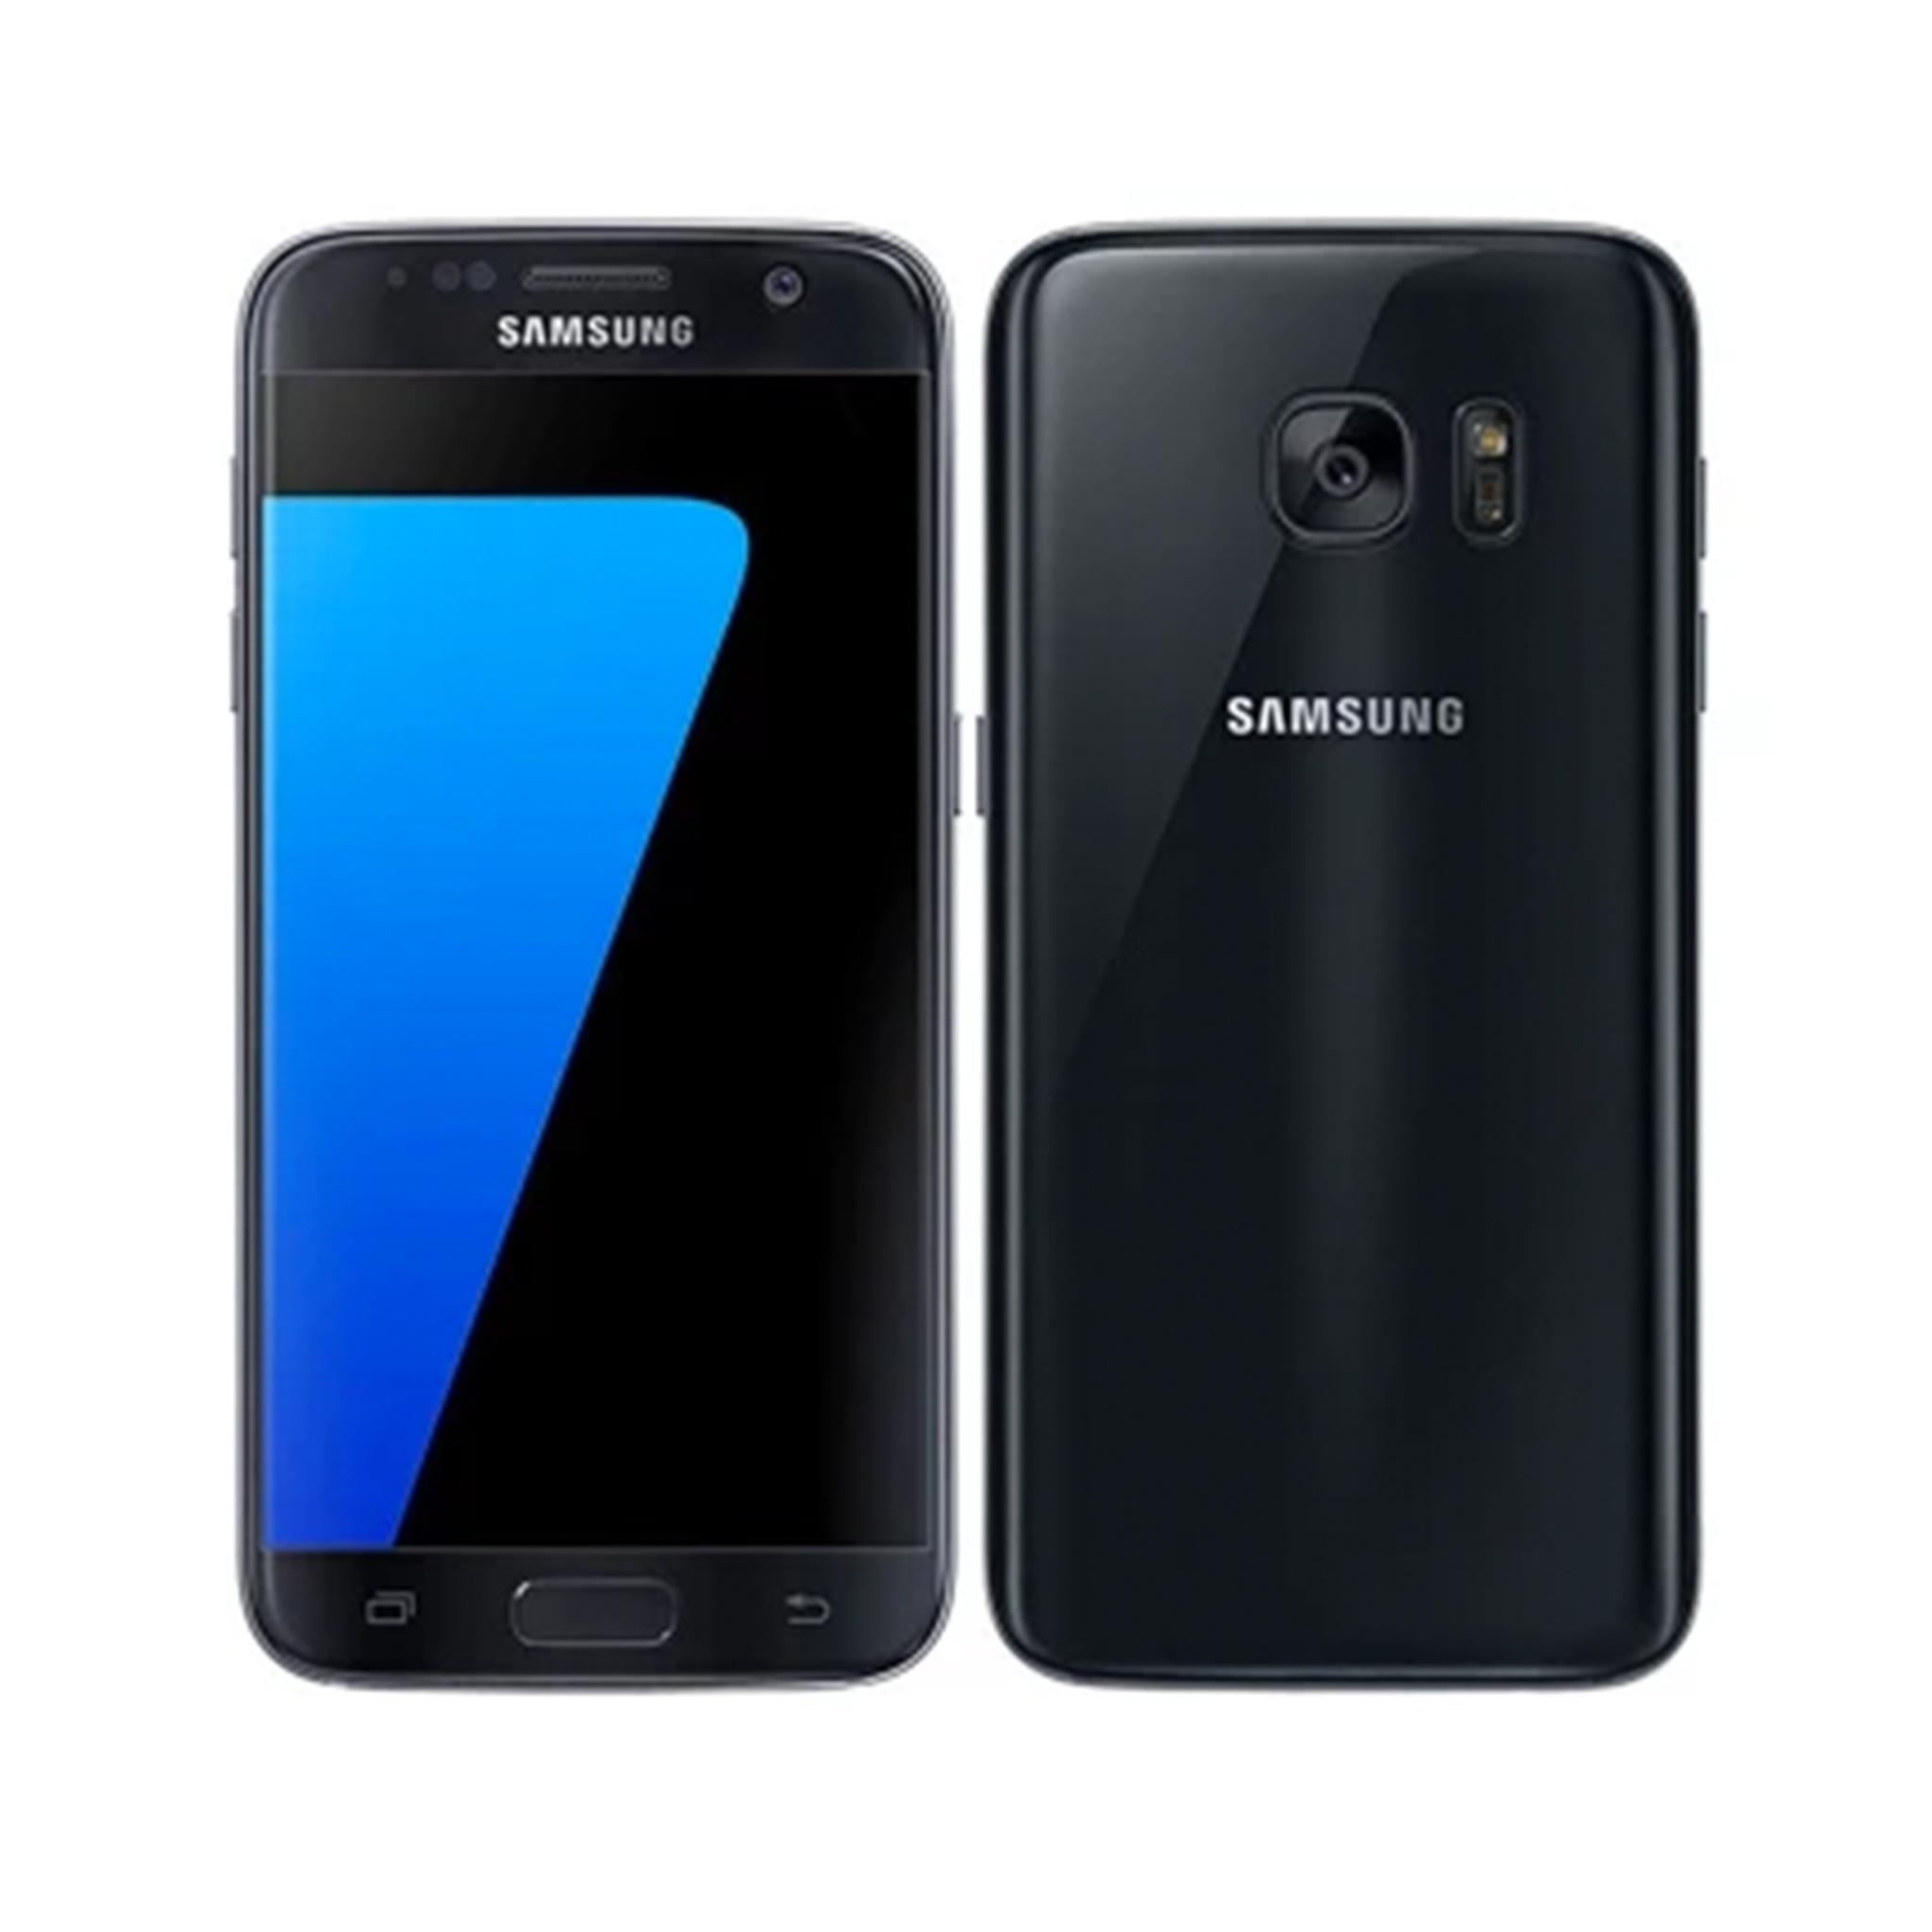 Samsung Galaxy S7 (Fullbox - Likenew 99%)